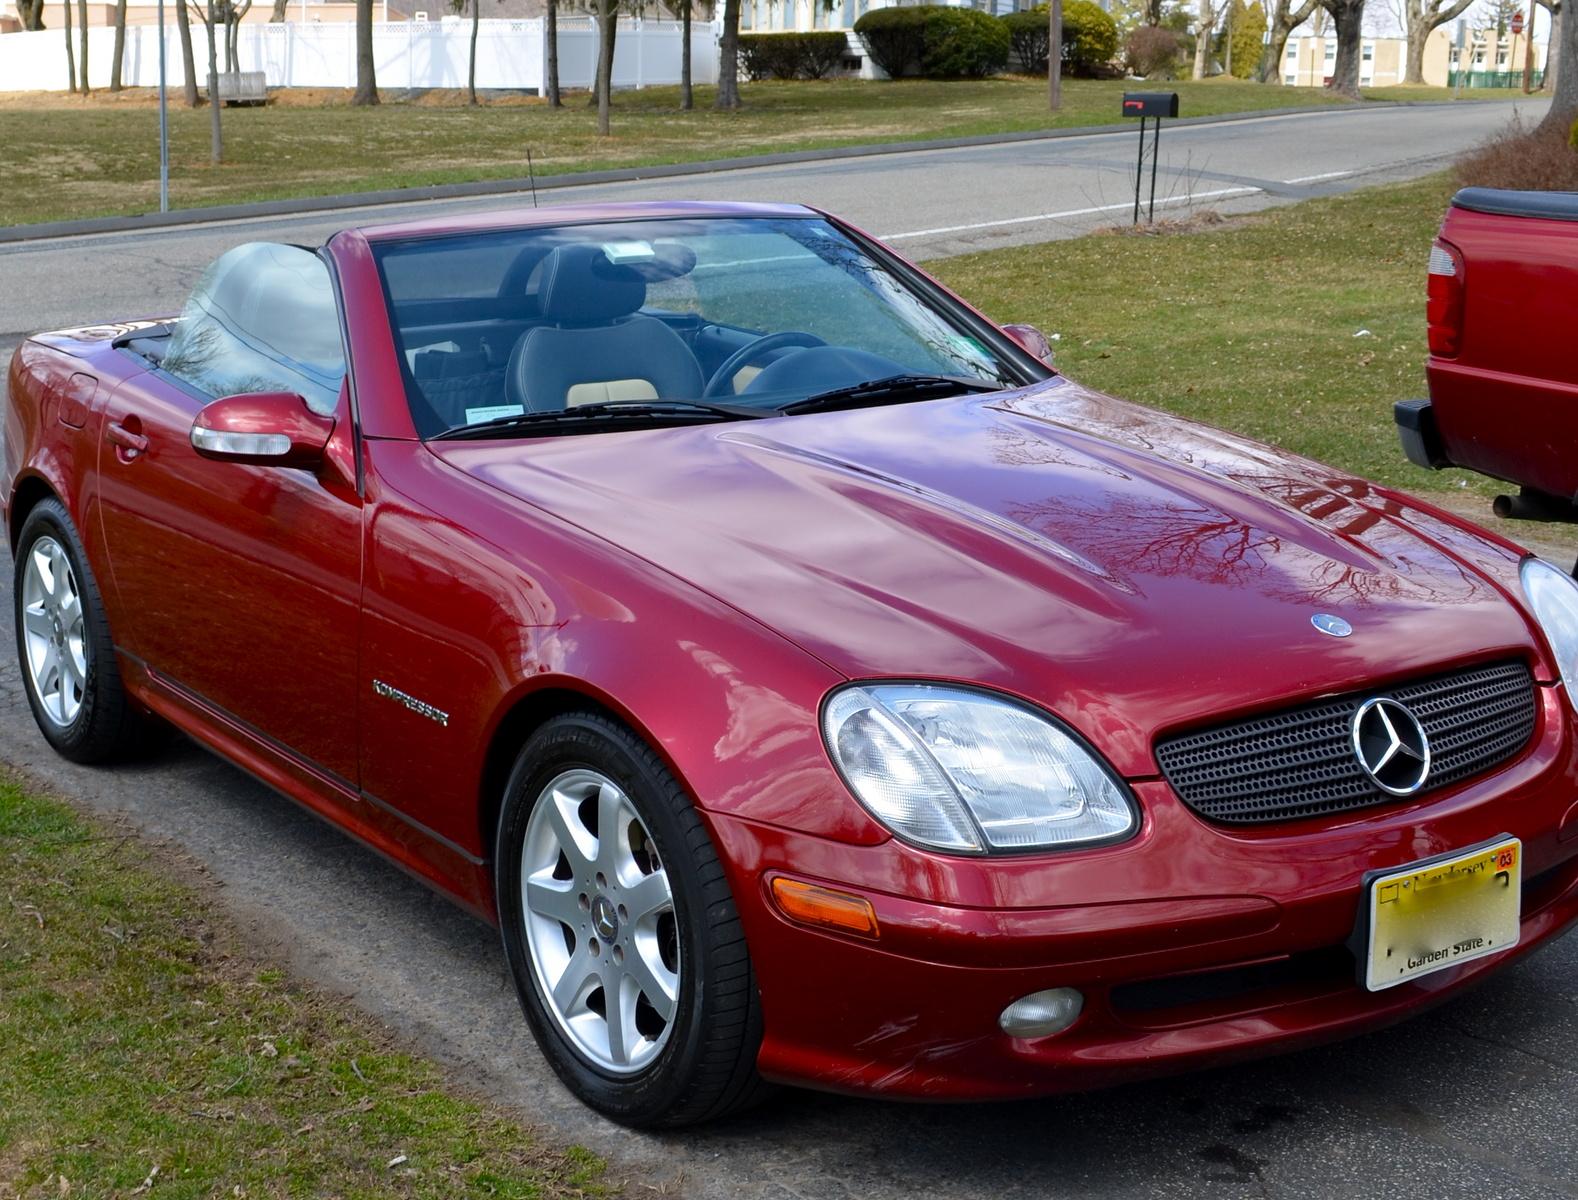 2002 Mercedes-Benz SLK-Class - Pictures - CarGurus